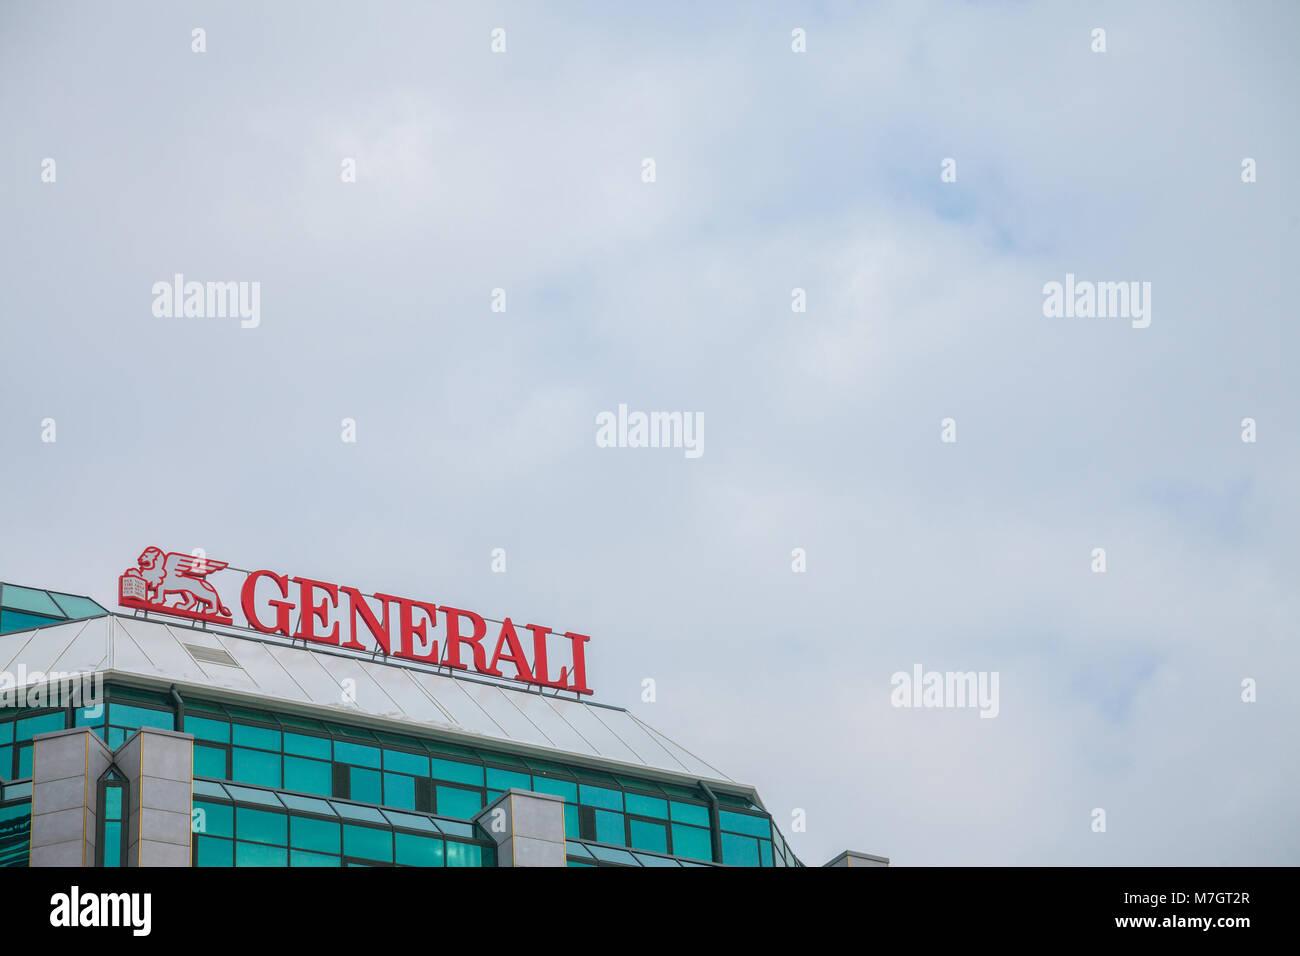 BELGRADE, SERBIA - MARCH 2, 2018: Generali Insurance logo on their main office for Serbia. Assicurazioni Generali - Stock Image